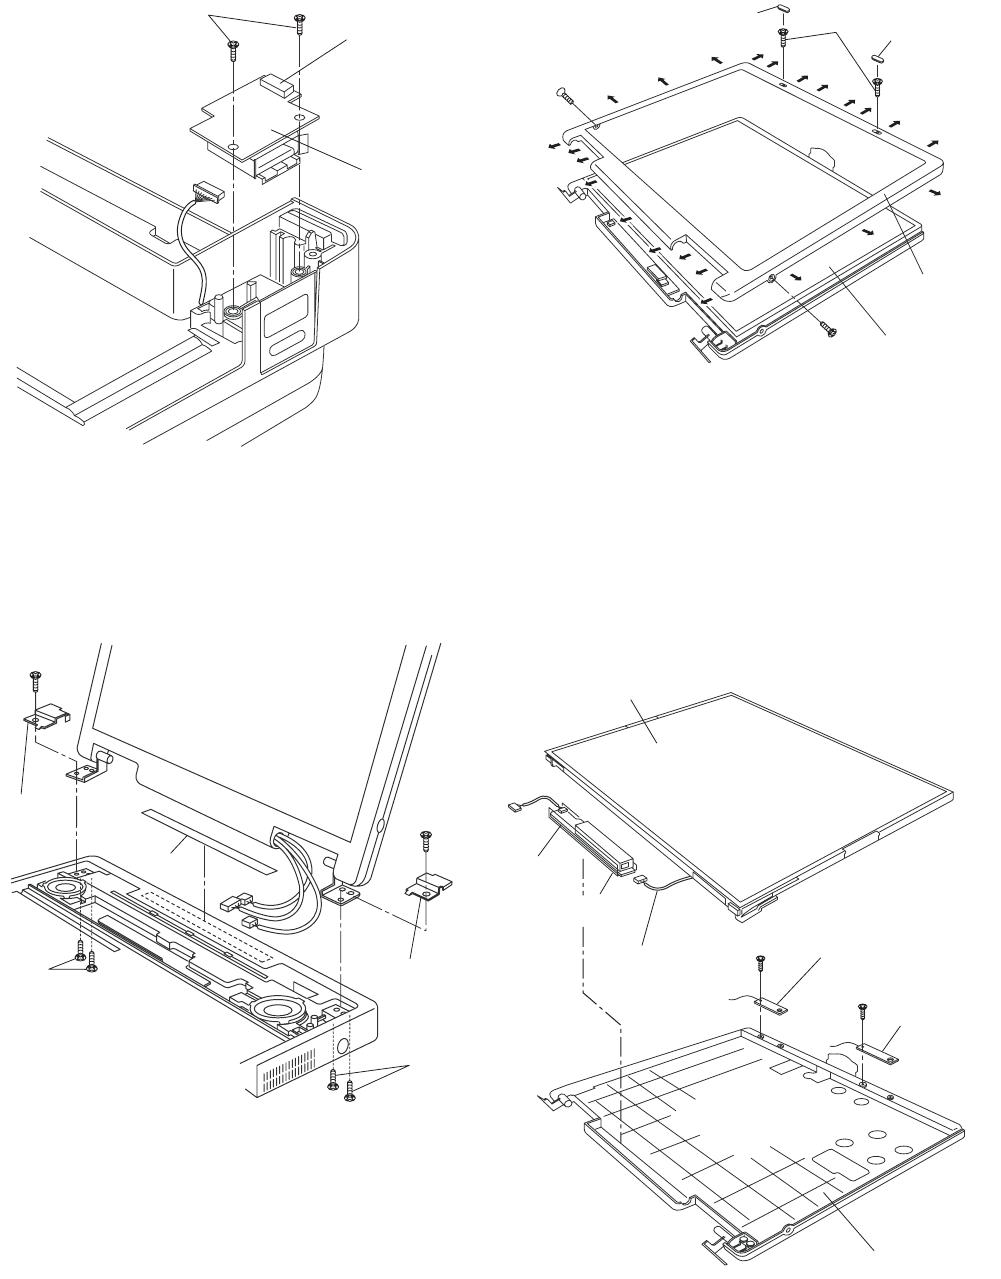 Panasonic CF-74JCJBD1 M 9.1.15. Removing the USB PCB, 9.1